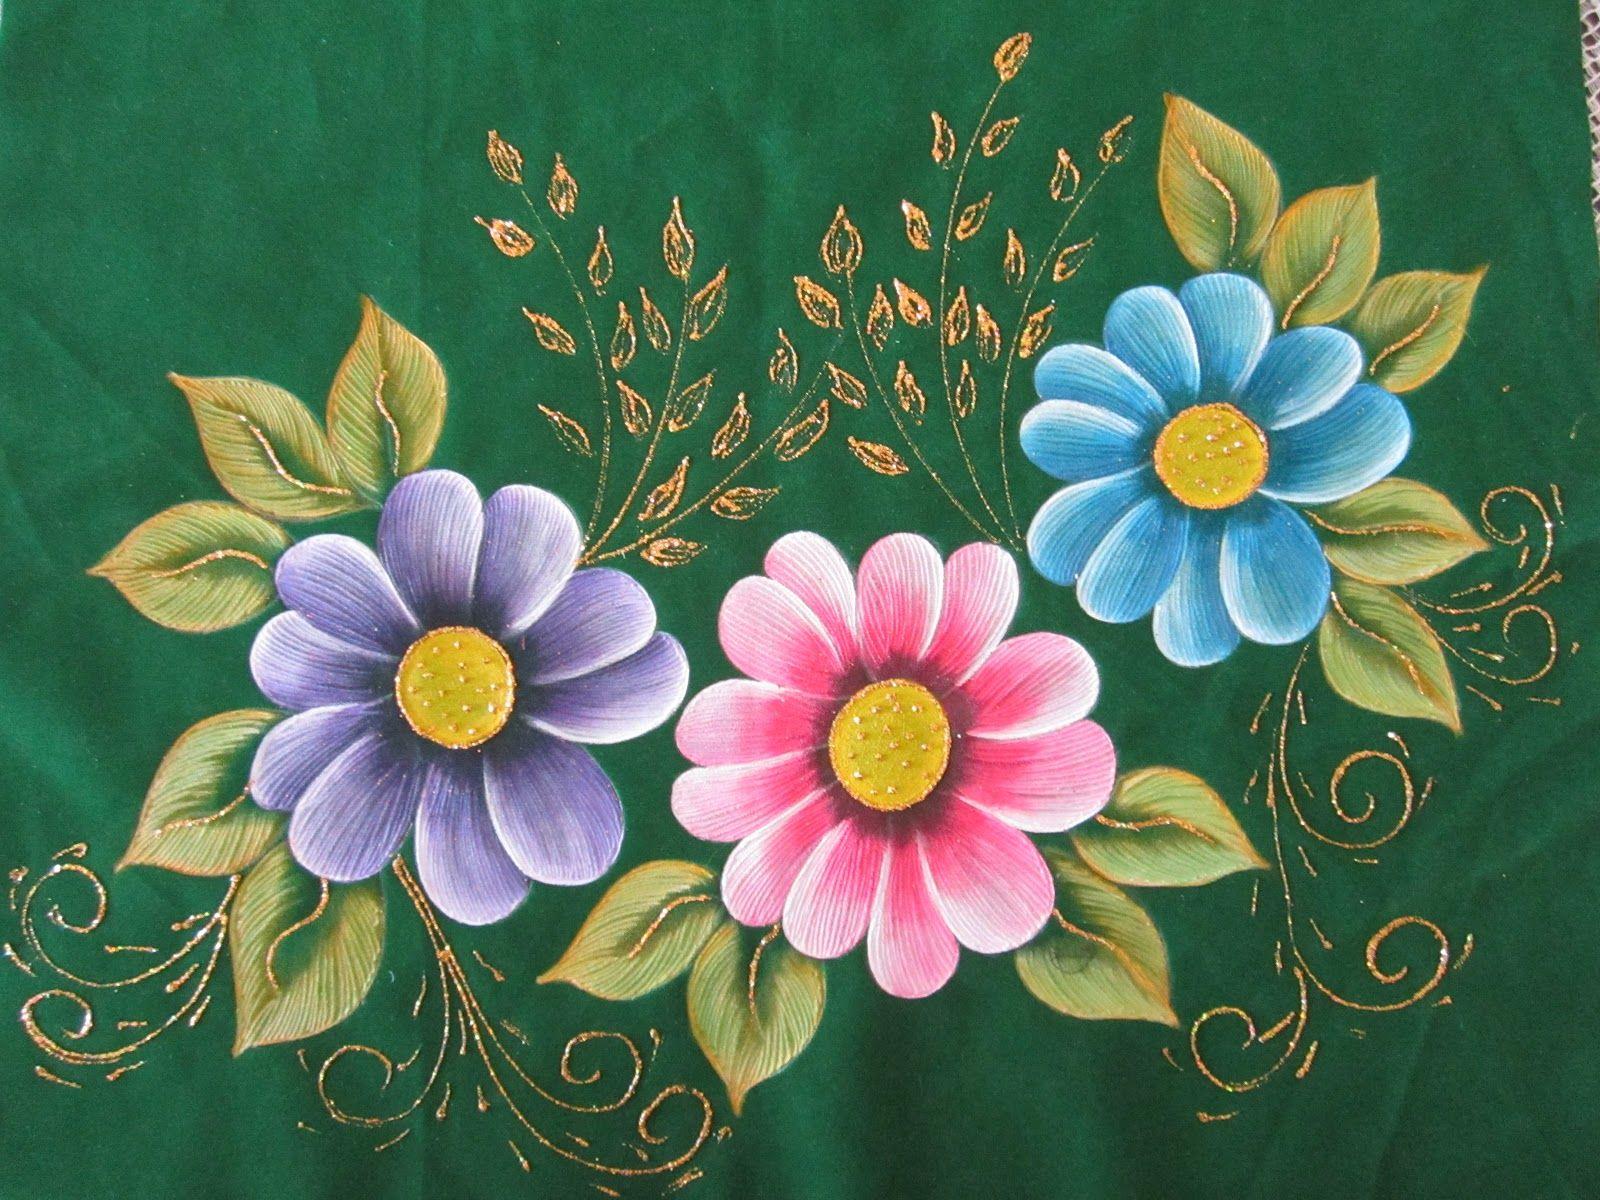 Img 0863 jpg 1600 1200 pintura en tela manteles - Imagenes de mesas con manteles ...